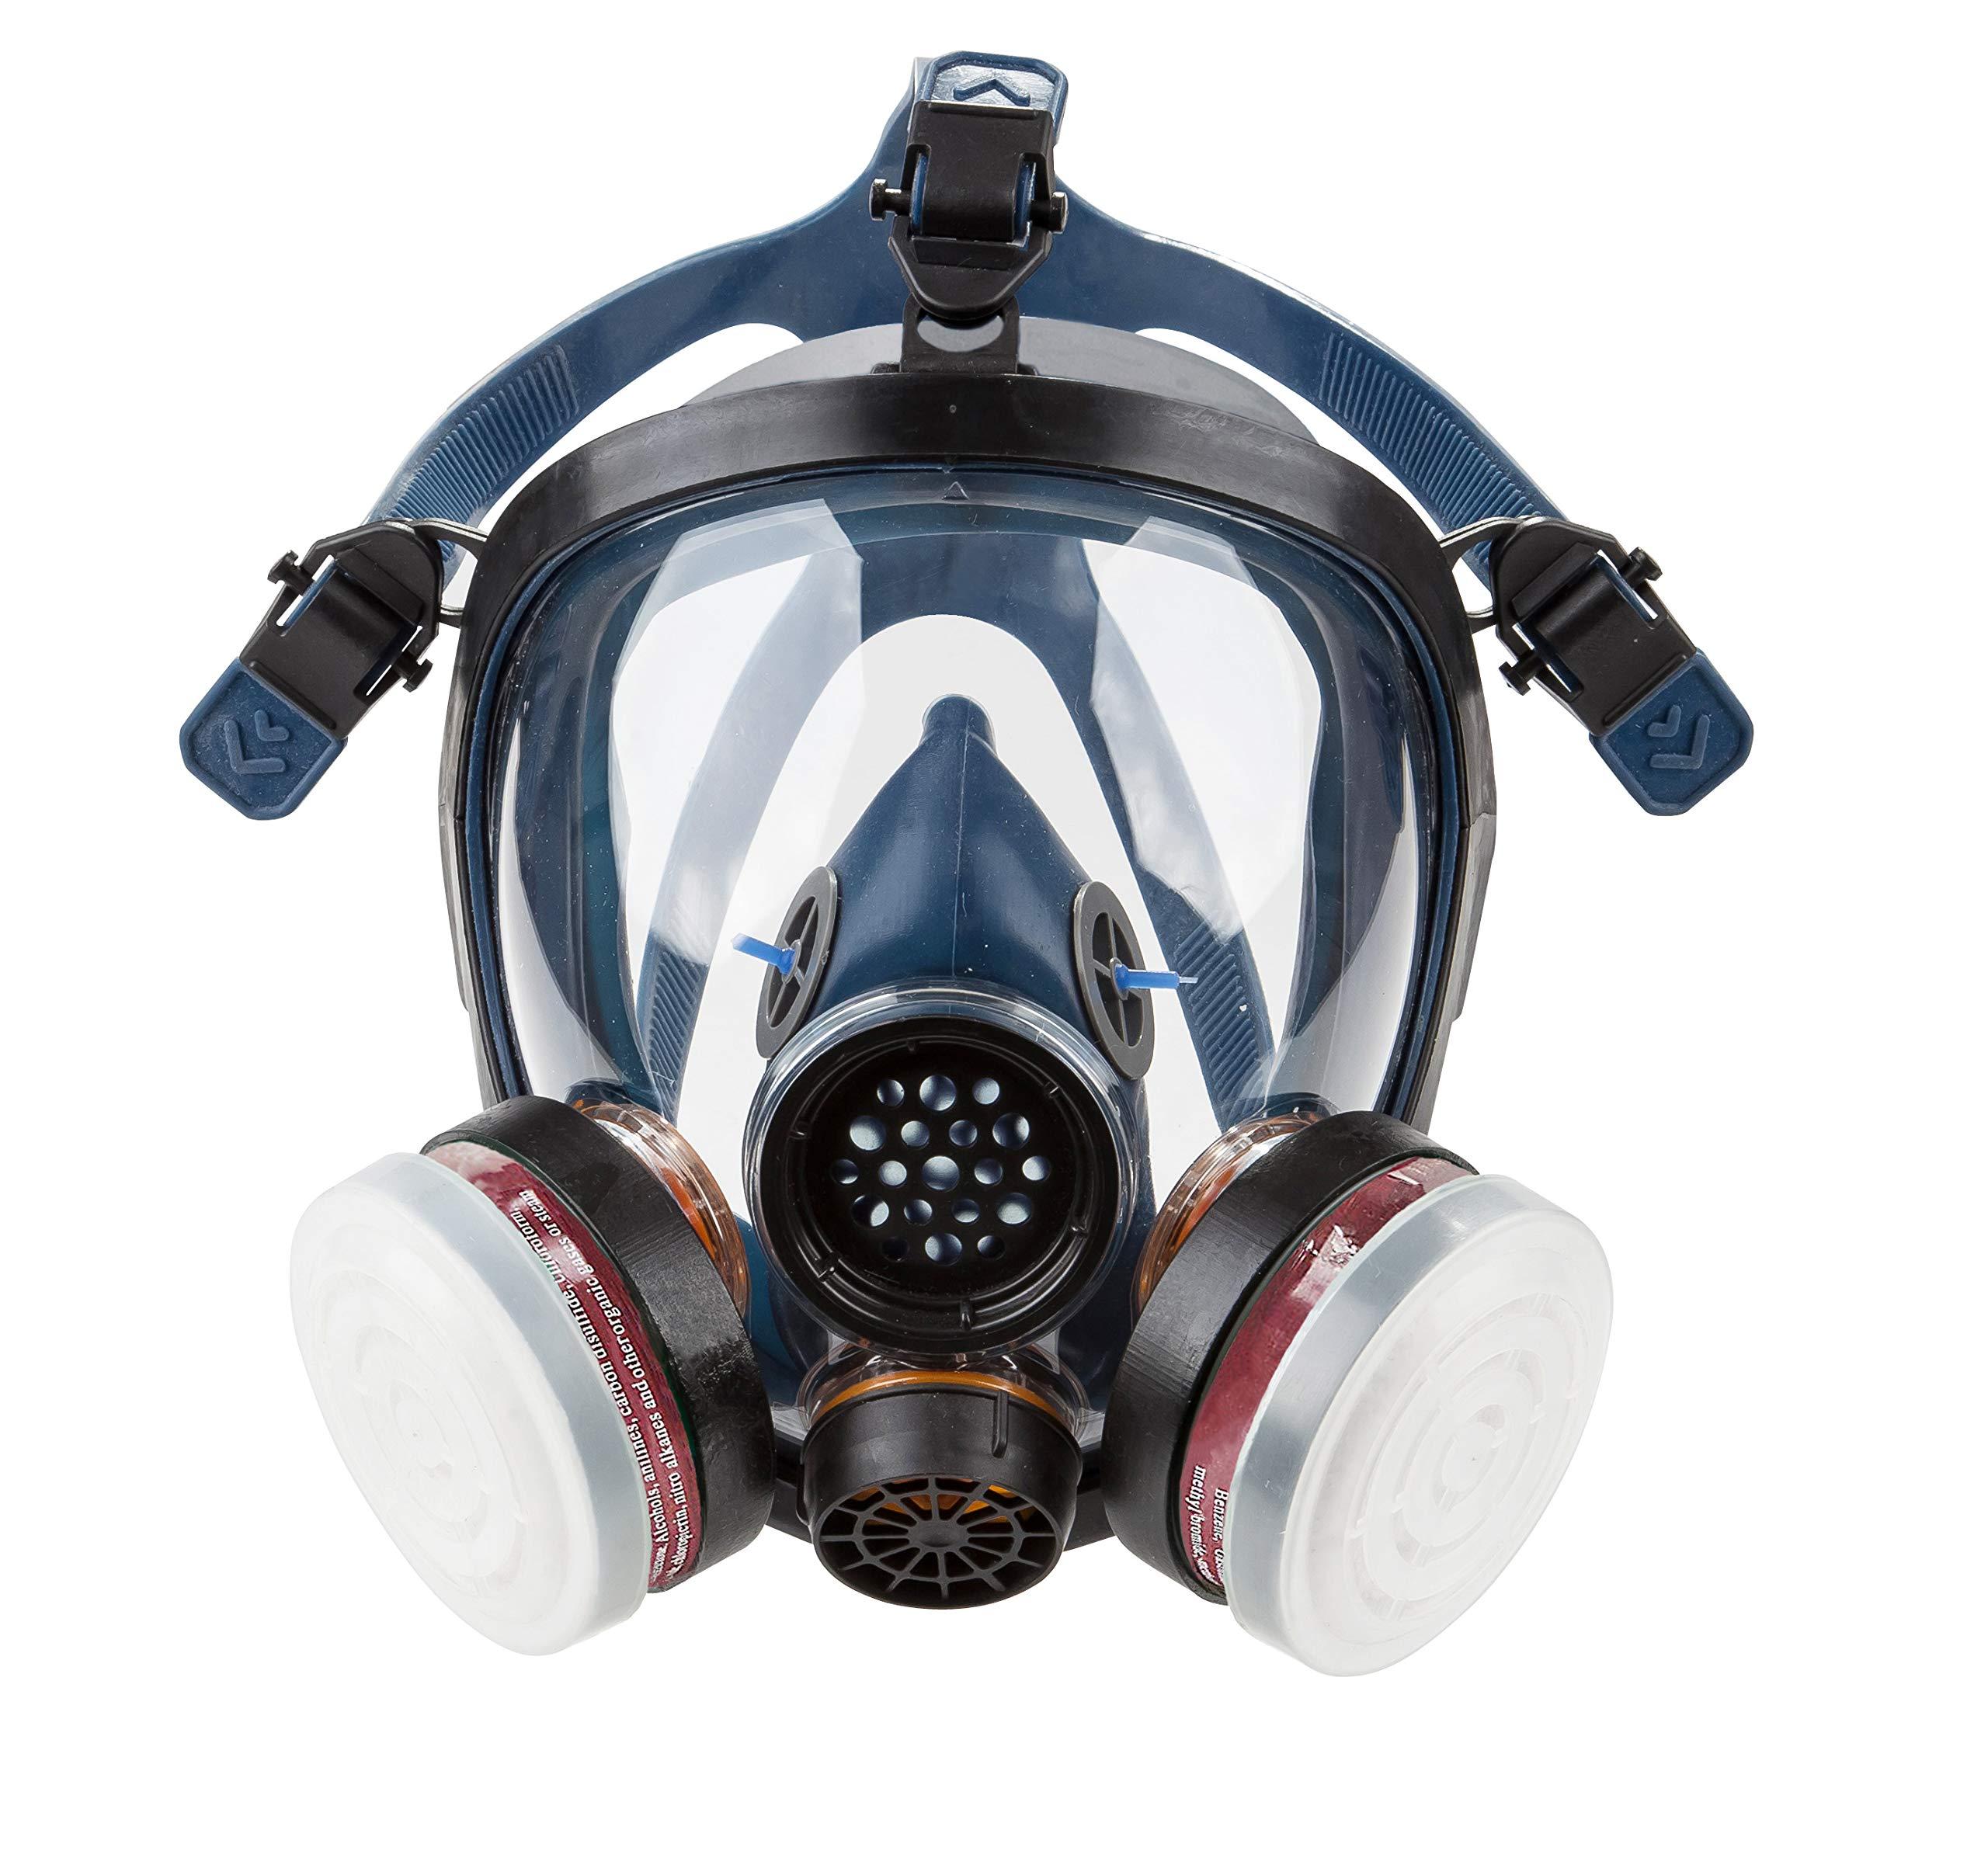 Induschoice Organic Vapor Full Face Respirator Mask Gas Mask Paint Pesticide Chemical Formaldehyde Anti Virus Respiratory Protection(Respirator +1 Pair LDY3 Cartridges) by Induschoice